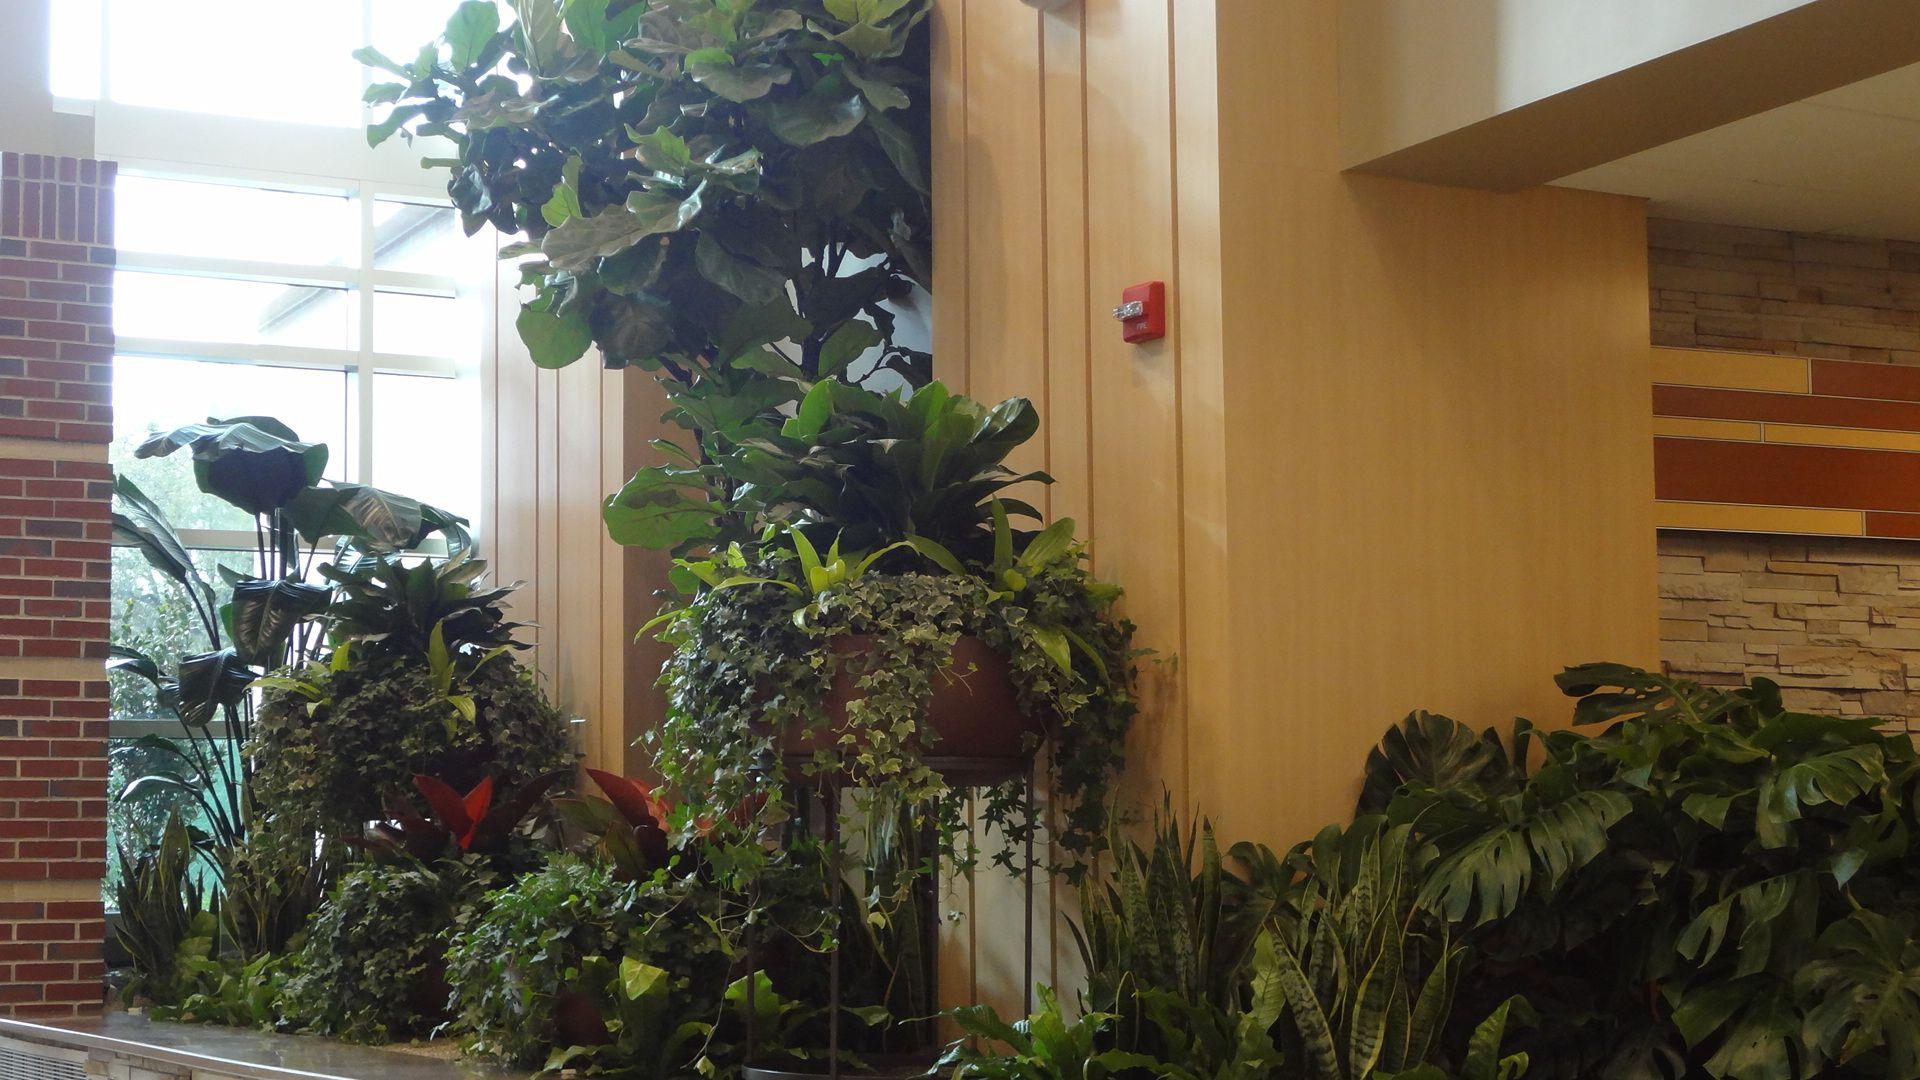 Panama City landscaping design company